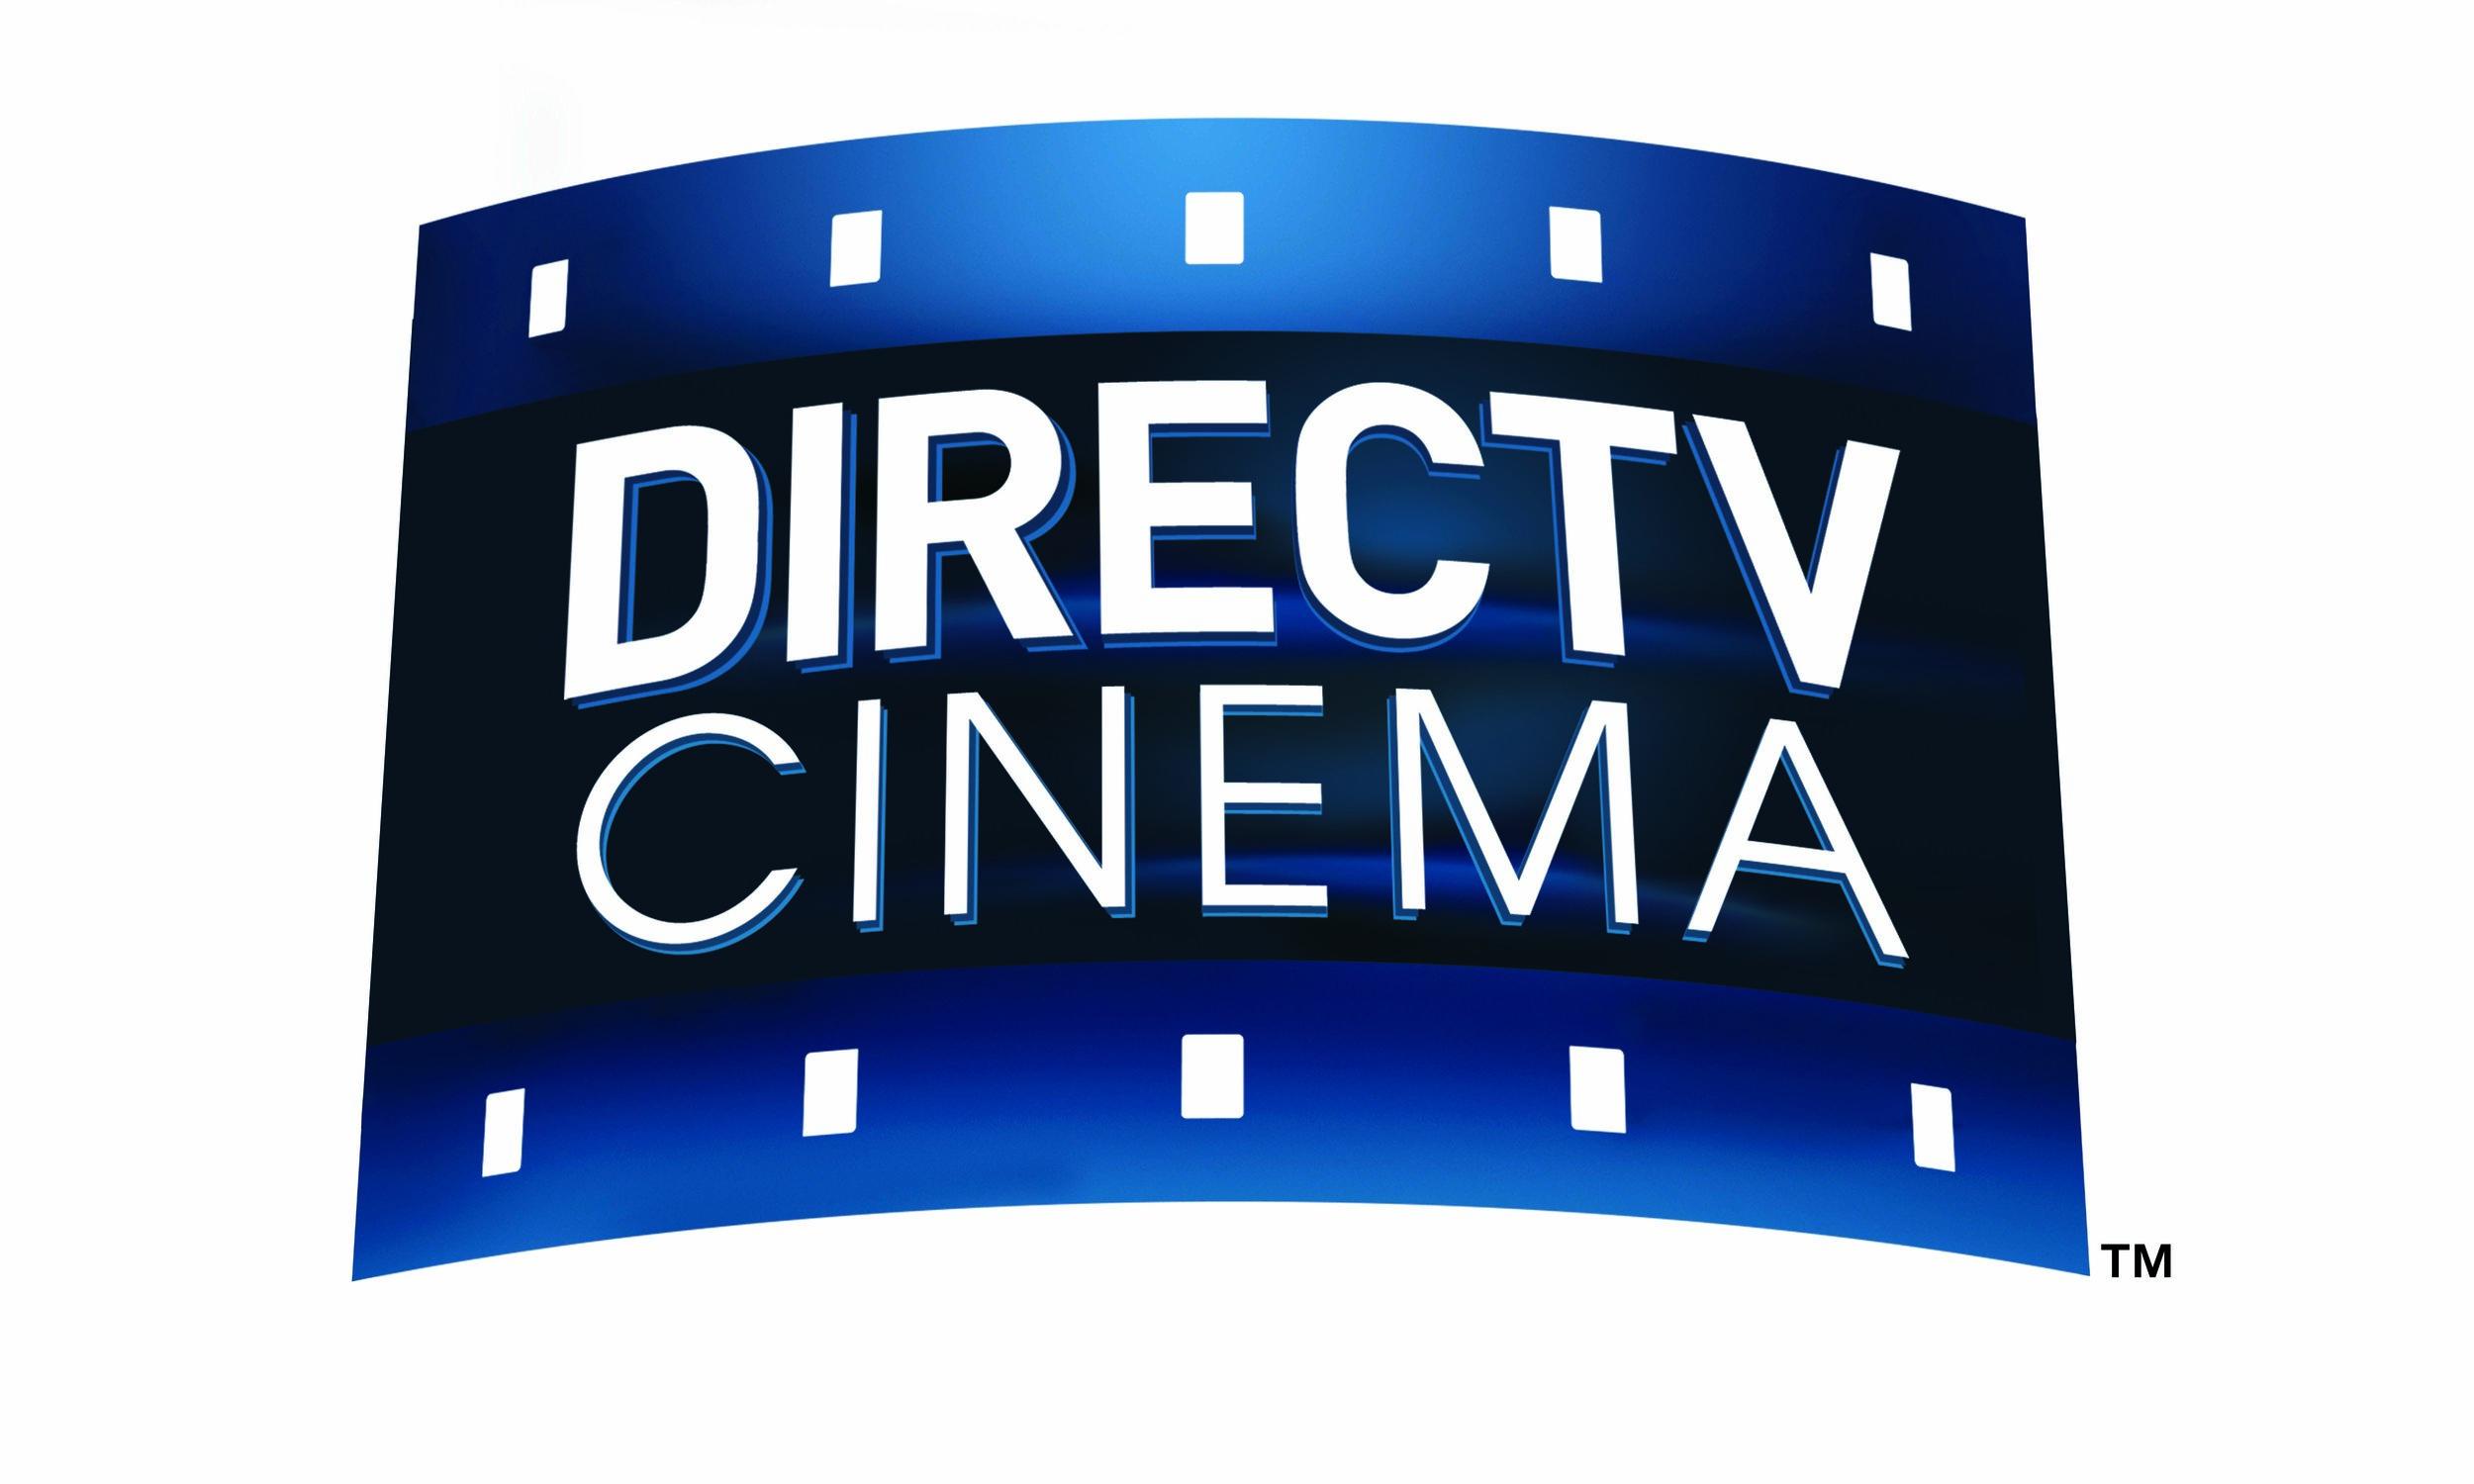 directv2.jpg